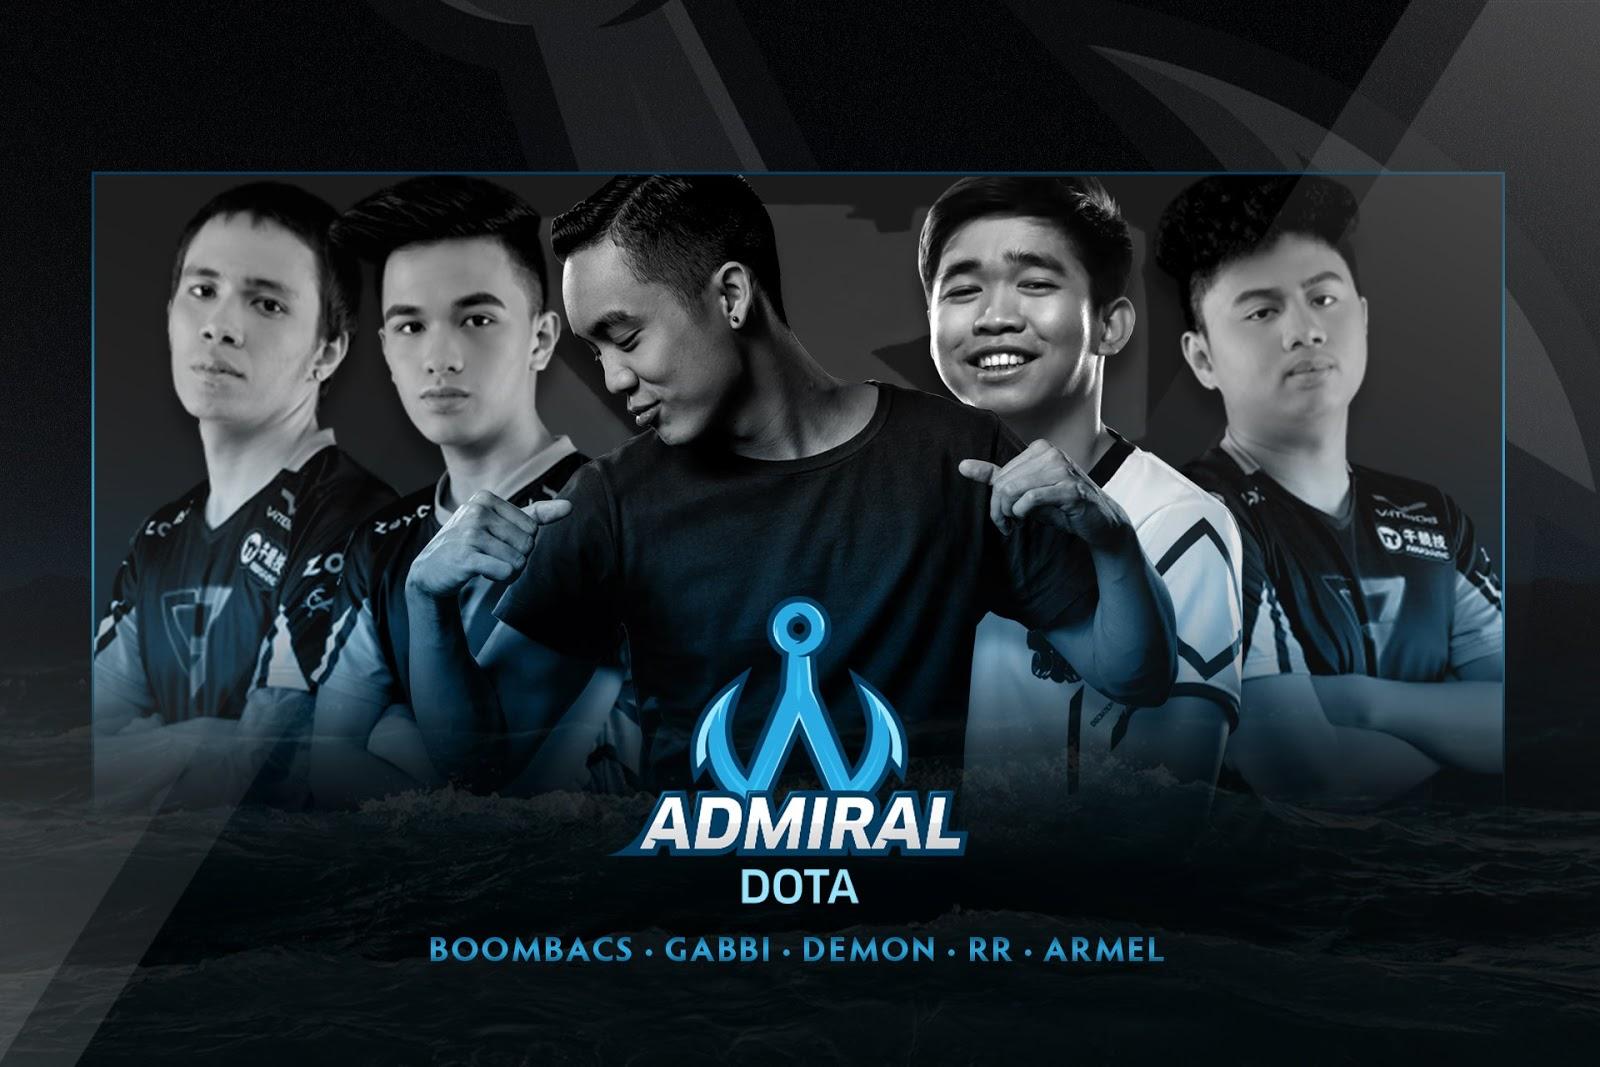 Team Admiral 2018 player lineup